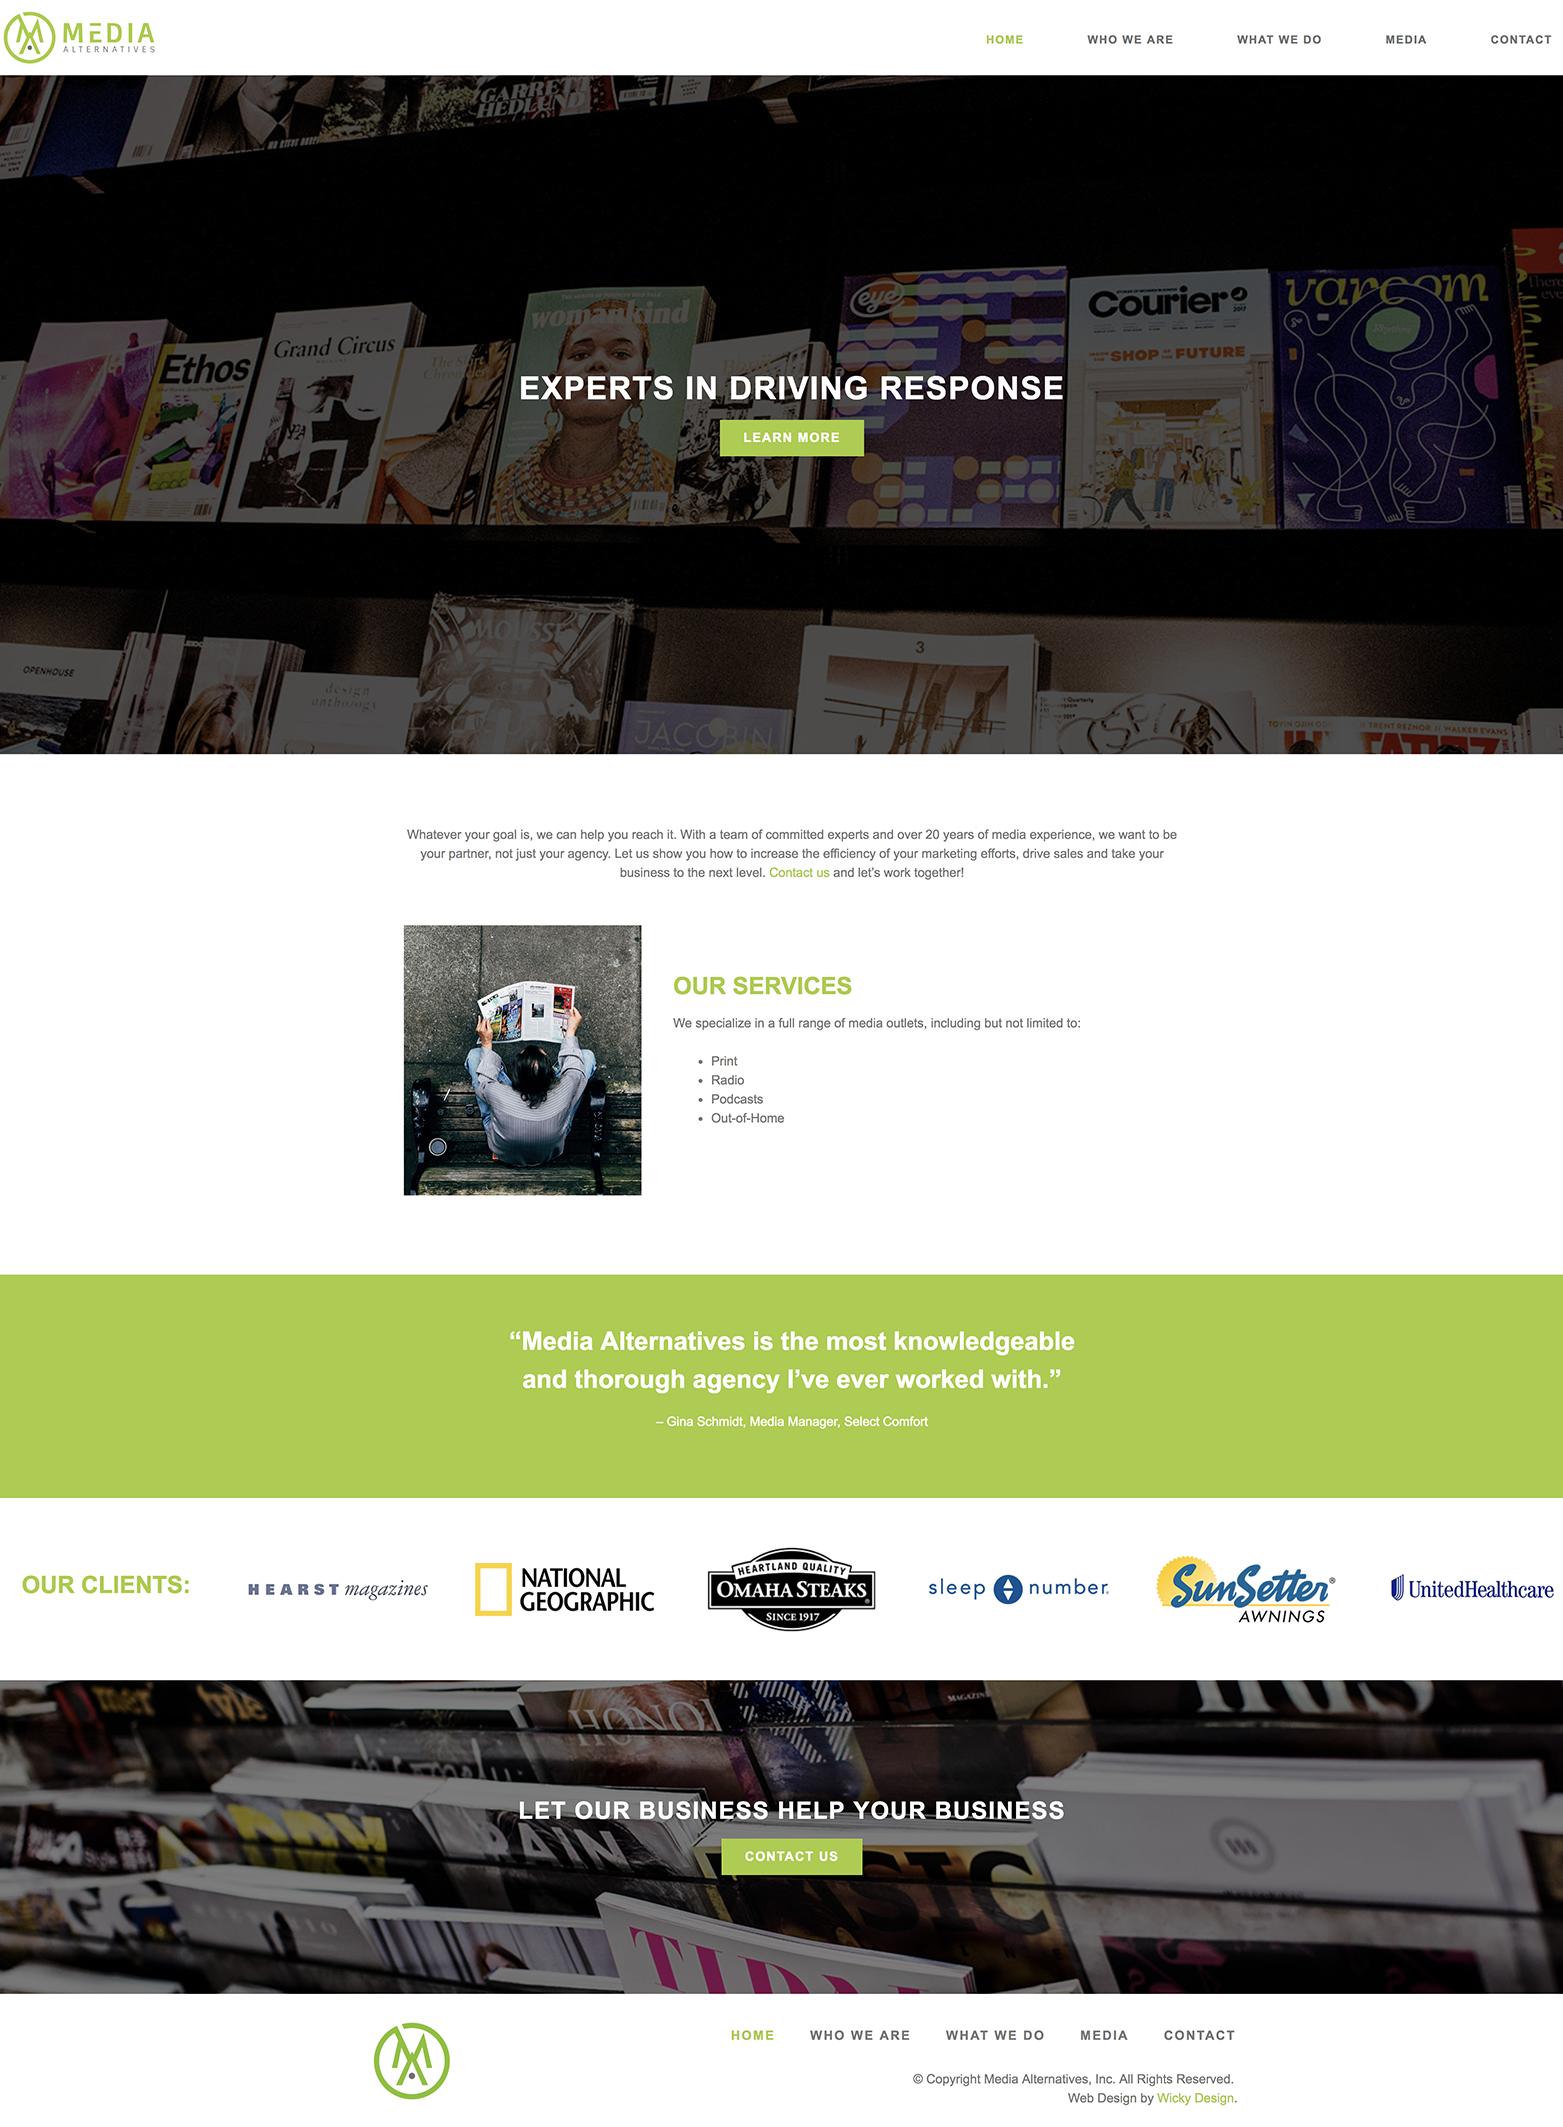 Web Design For Media Alternatives By Wicky Design With Images Wordpress Web Design Web Design Wordpress Website Design